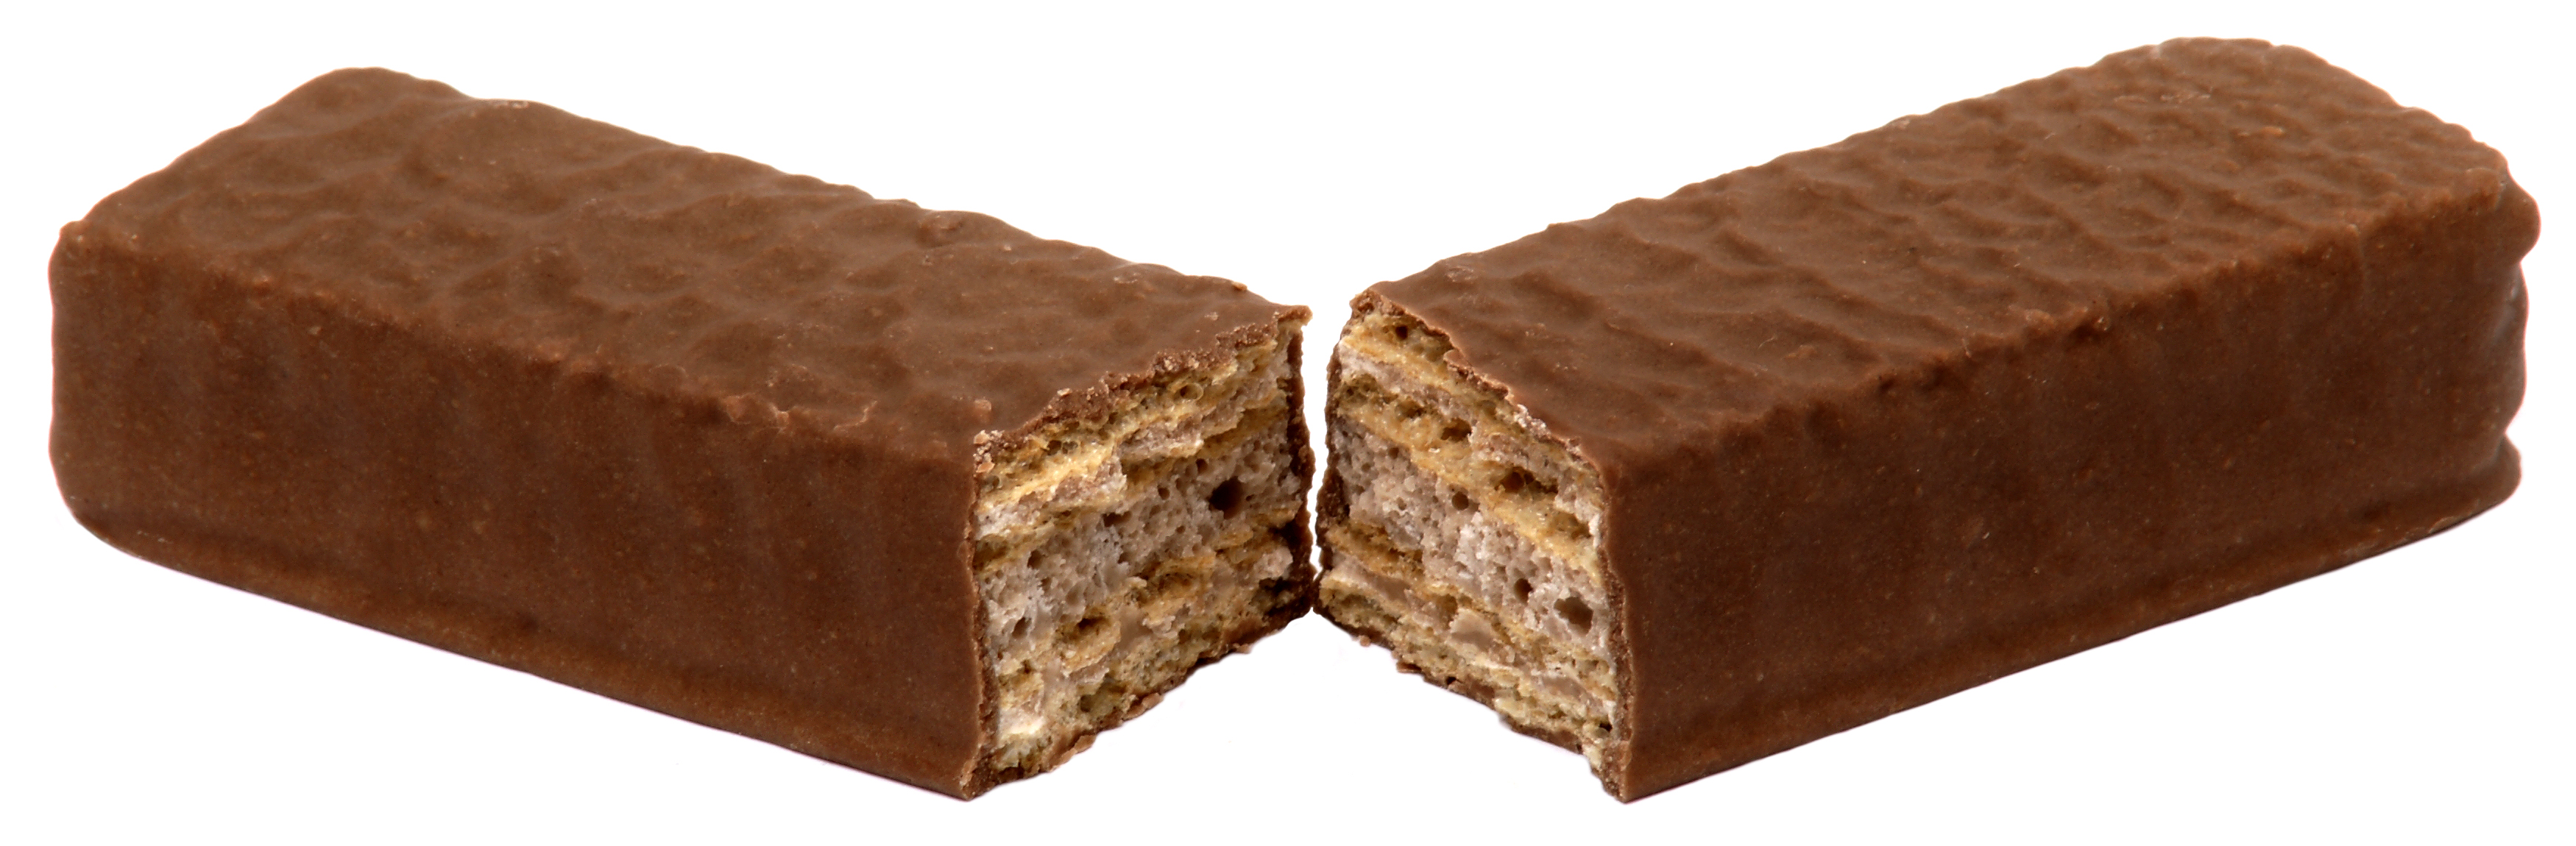 Coffee flavored chocolate bar